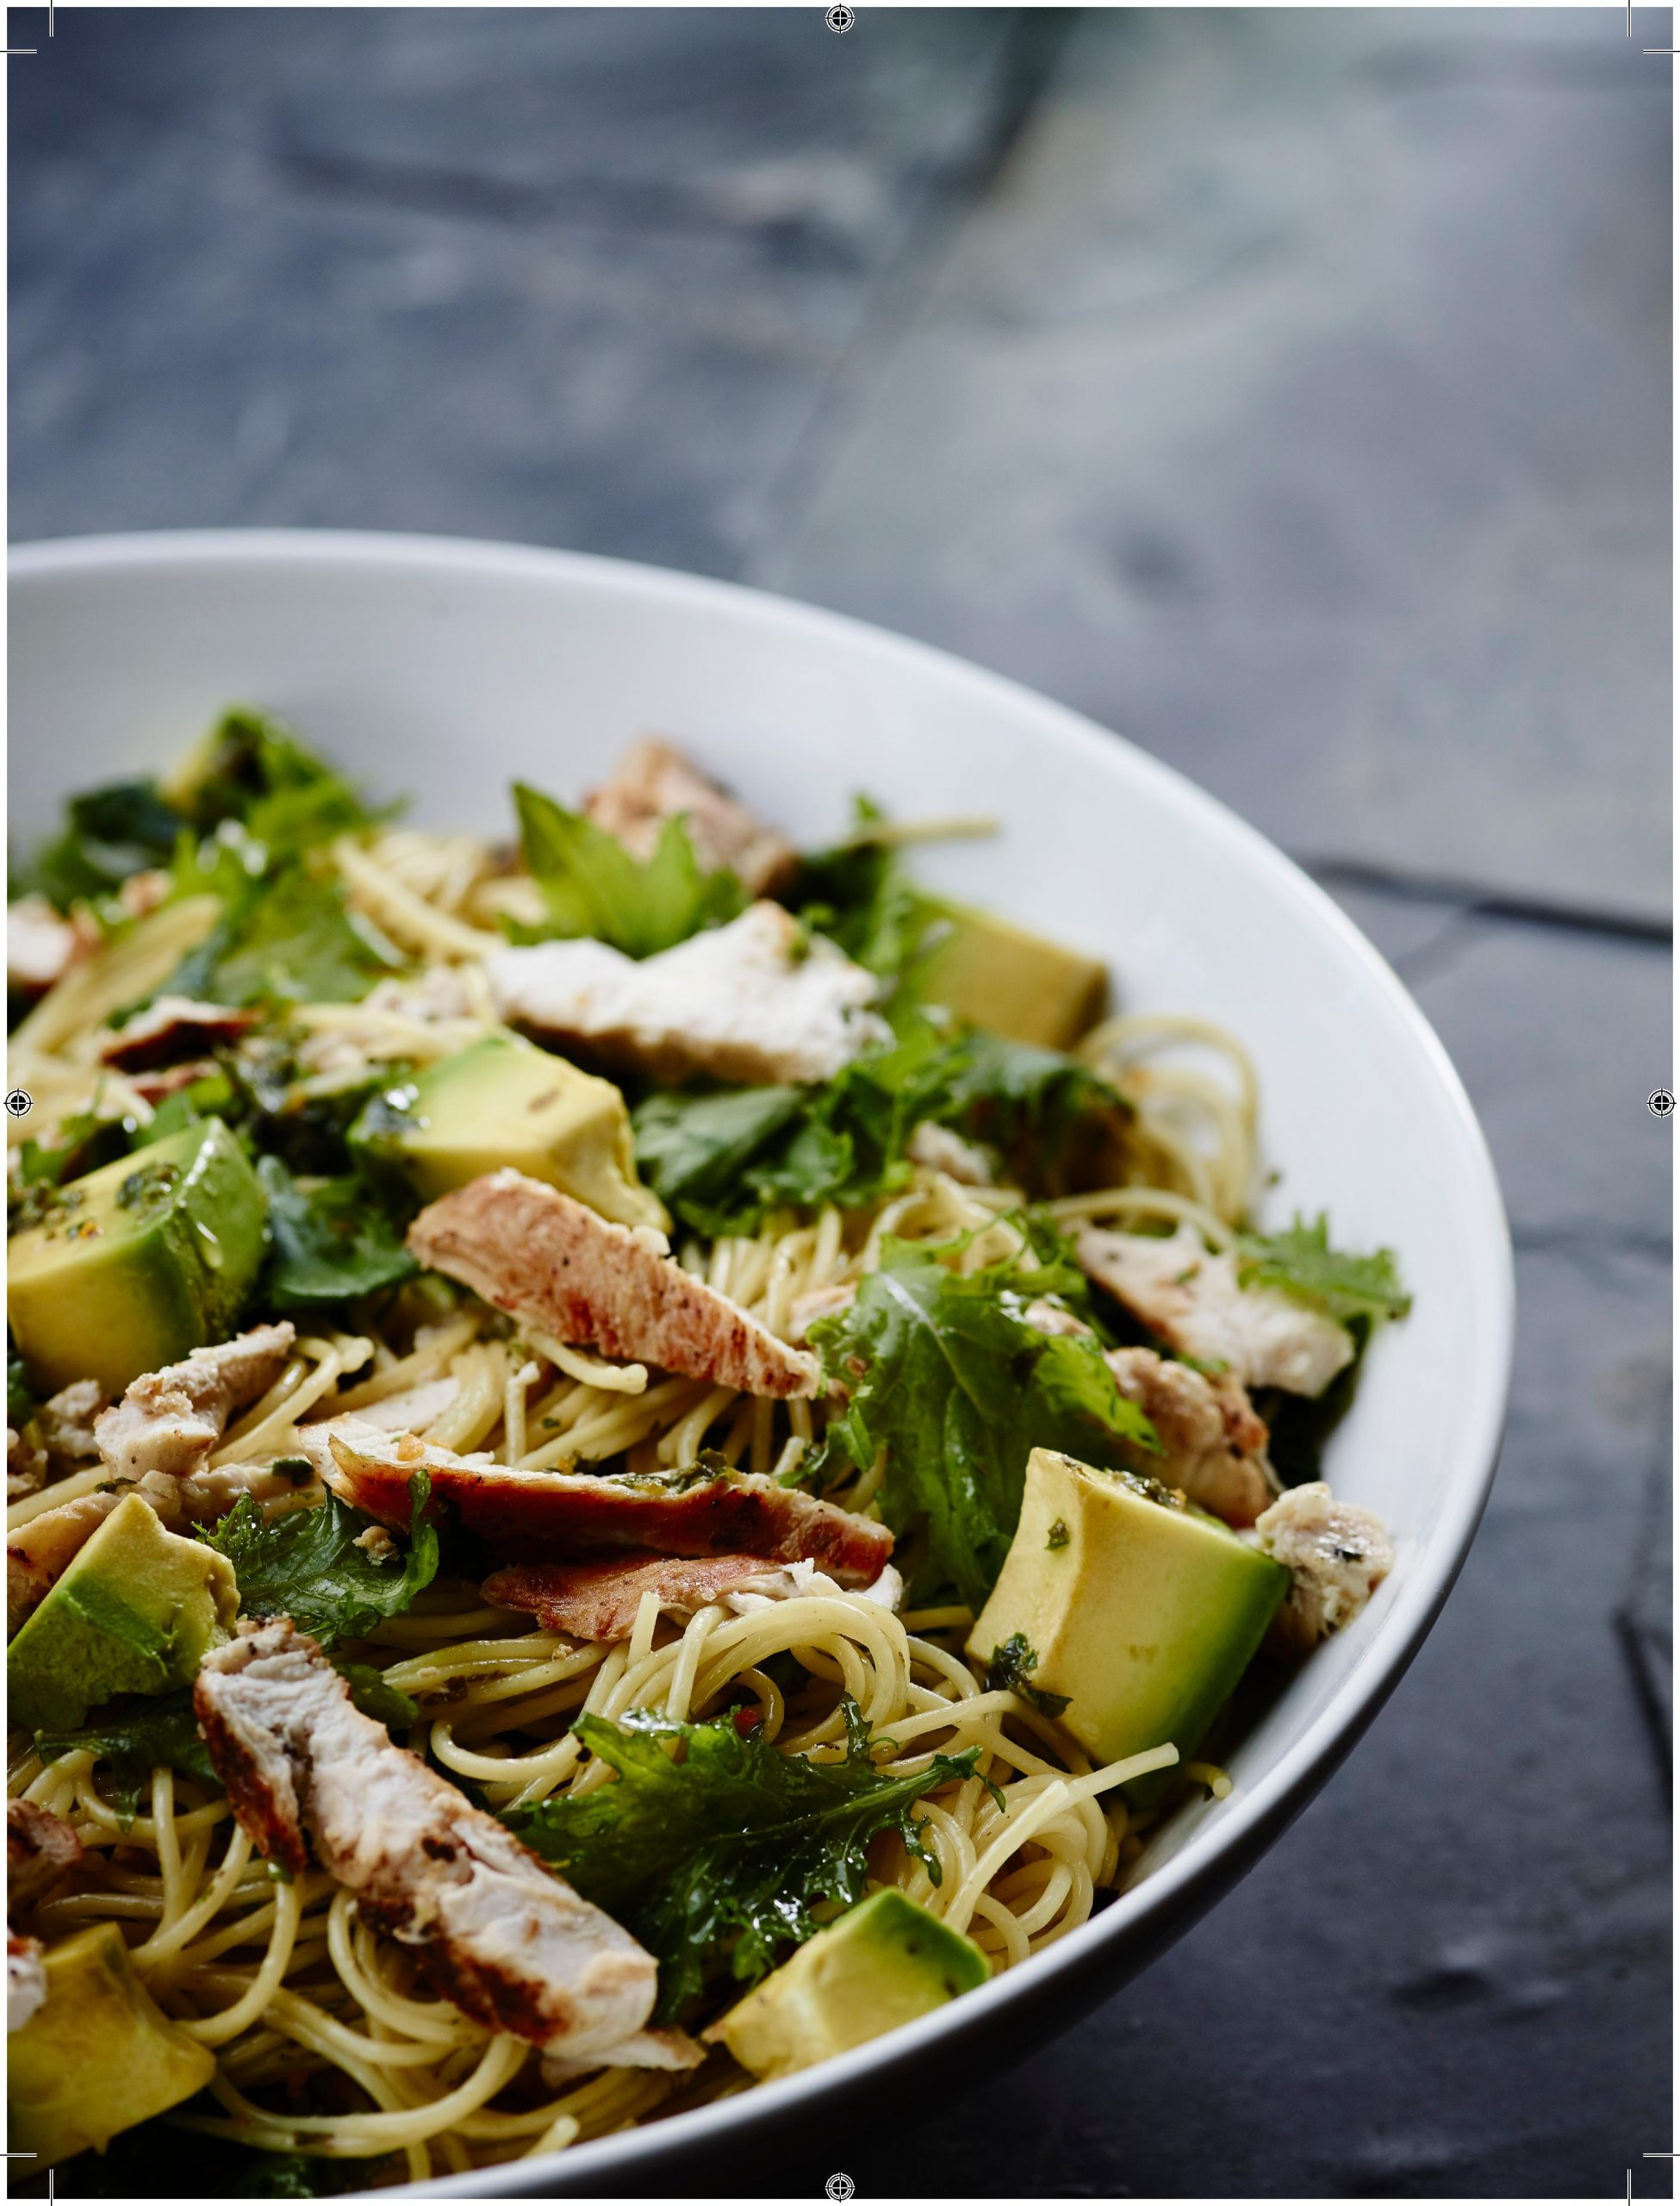 Chicken, Avocado and Kale Spaghetti